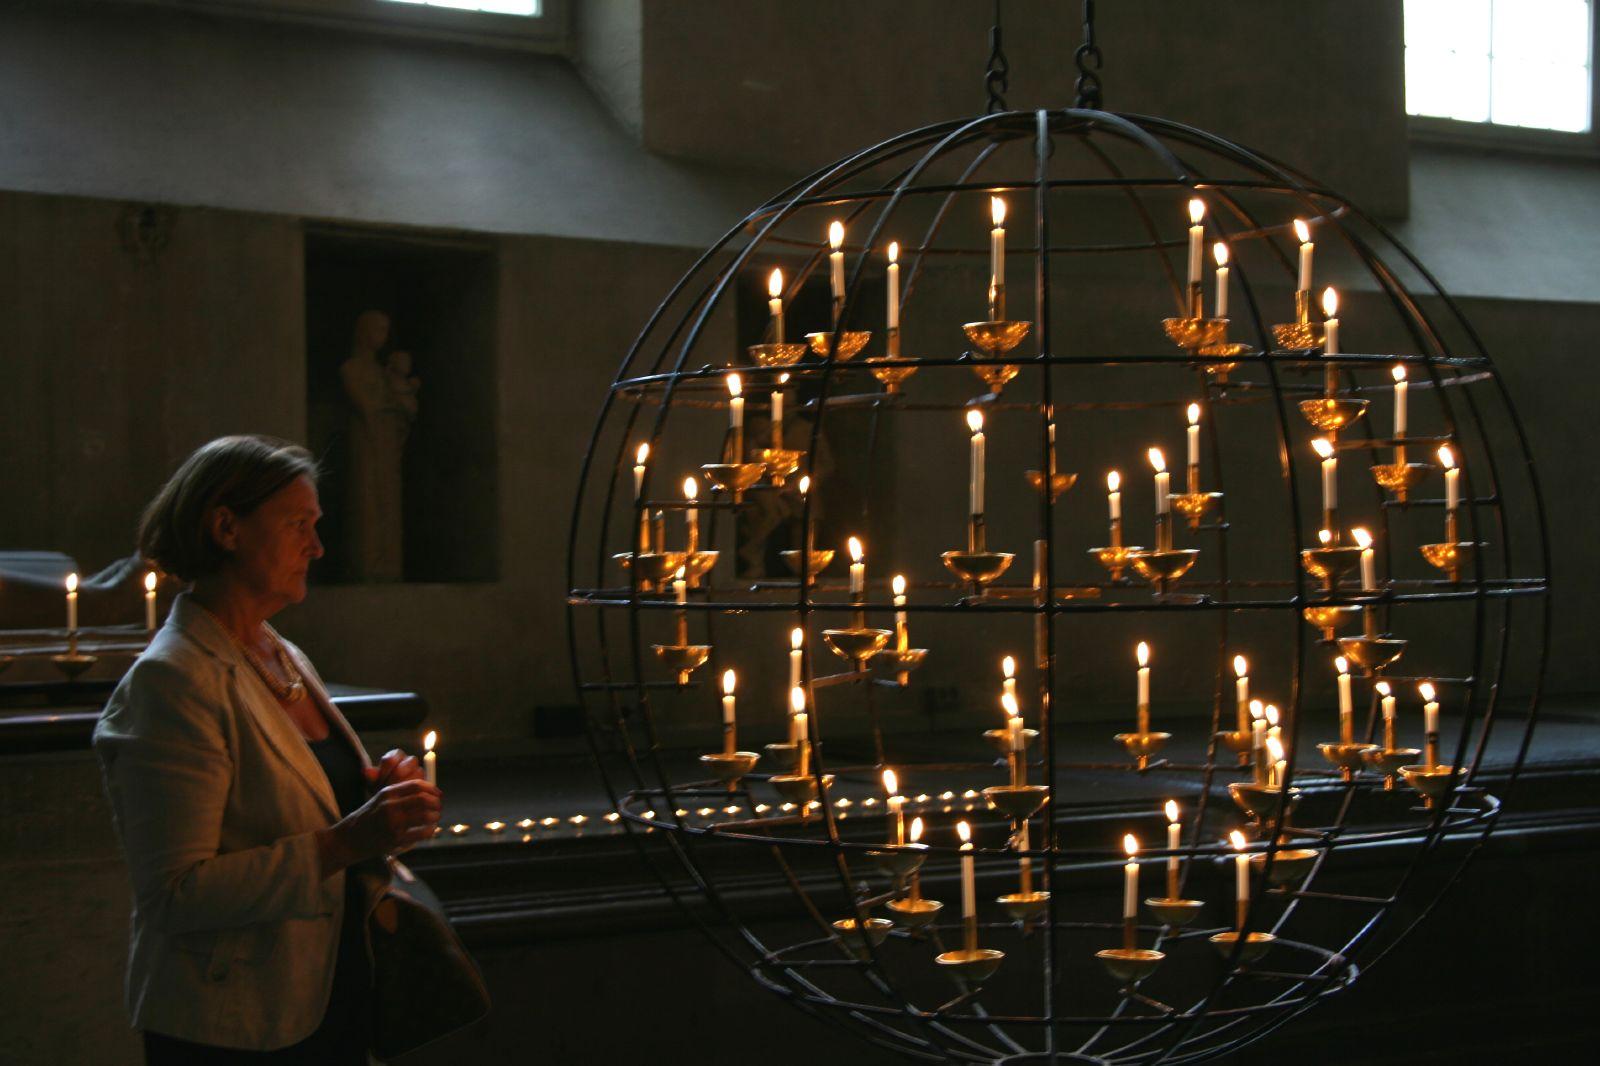 church_of_sweden_2856028423629